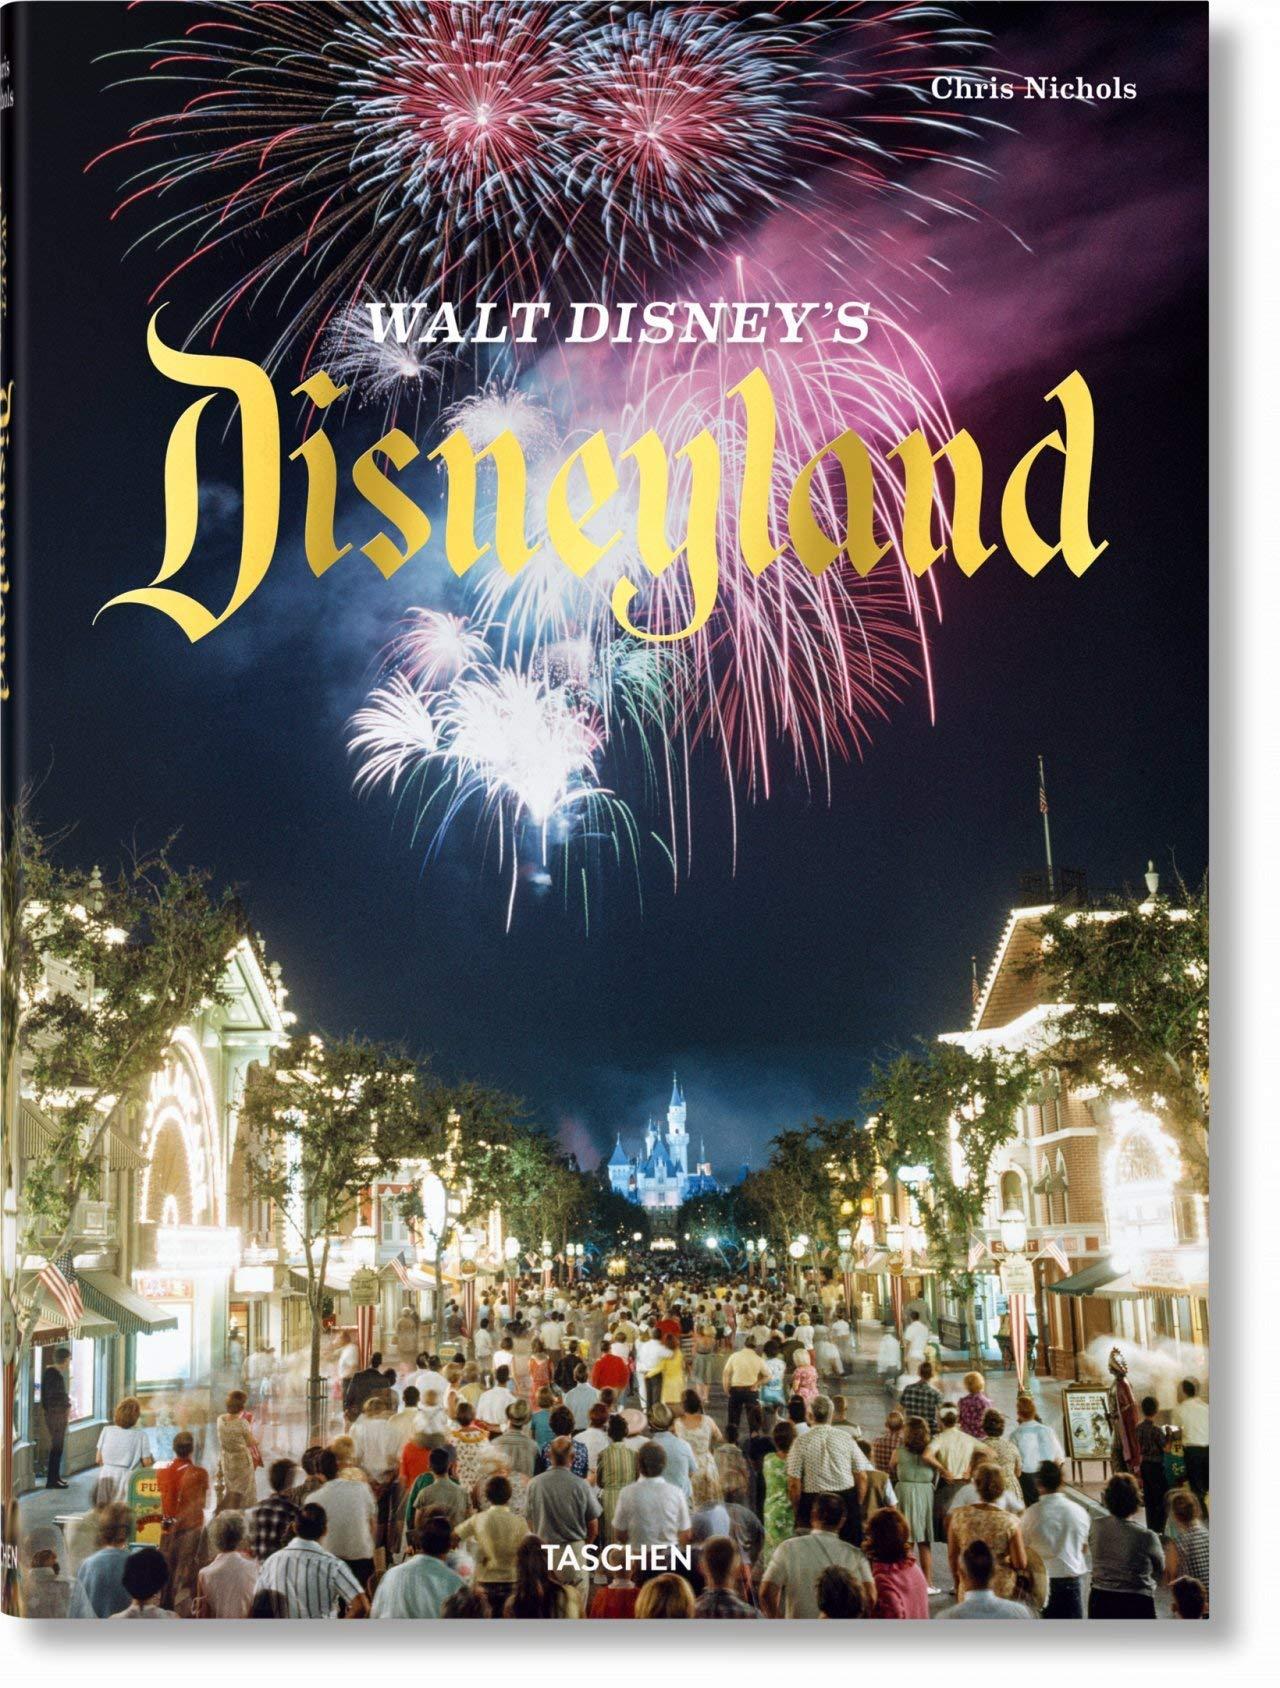 Walt Disney S Disneyland Chris Nichols 9783836563482 Amazon Com